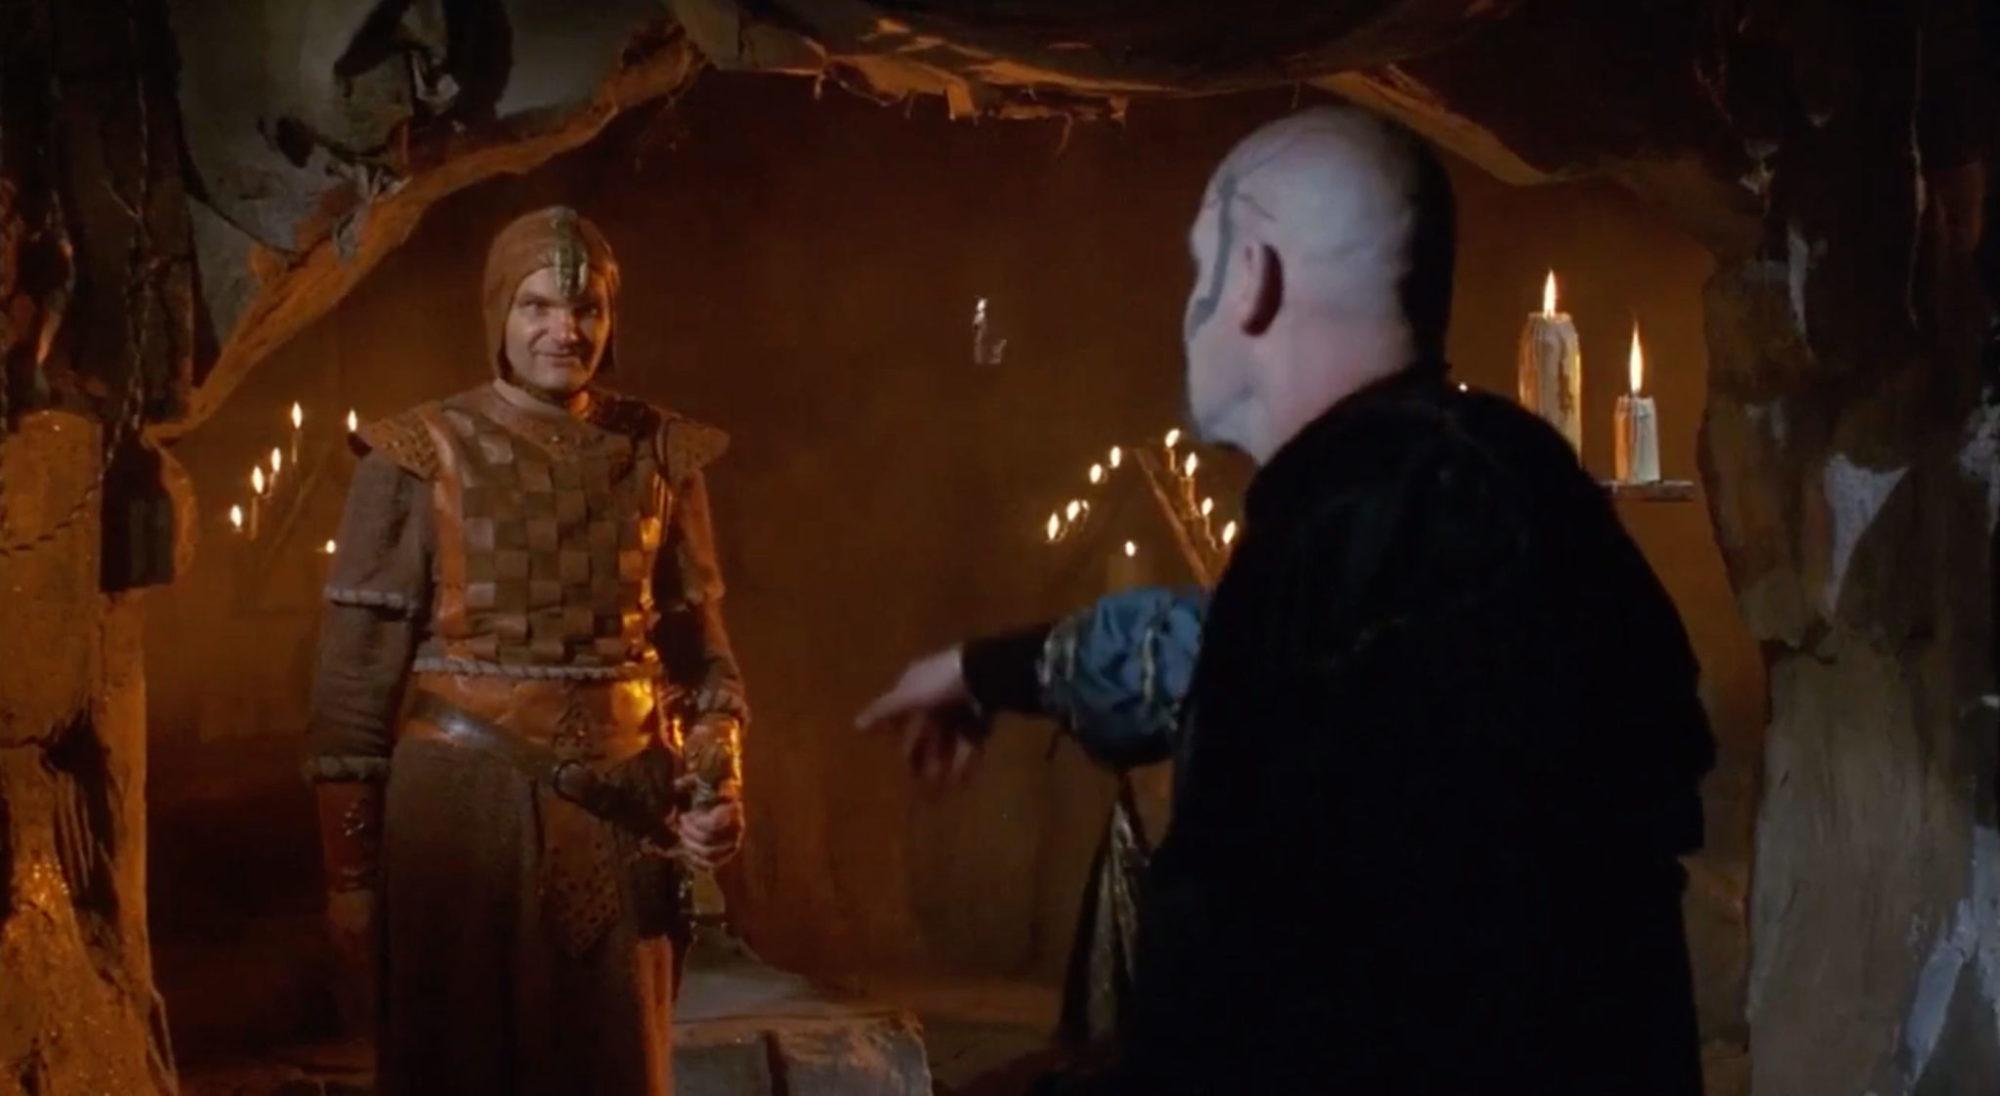 Bernard Erhard as Munkar in Deathstalker (1983), CultCelebrities.com